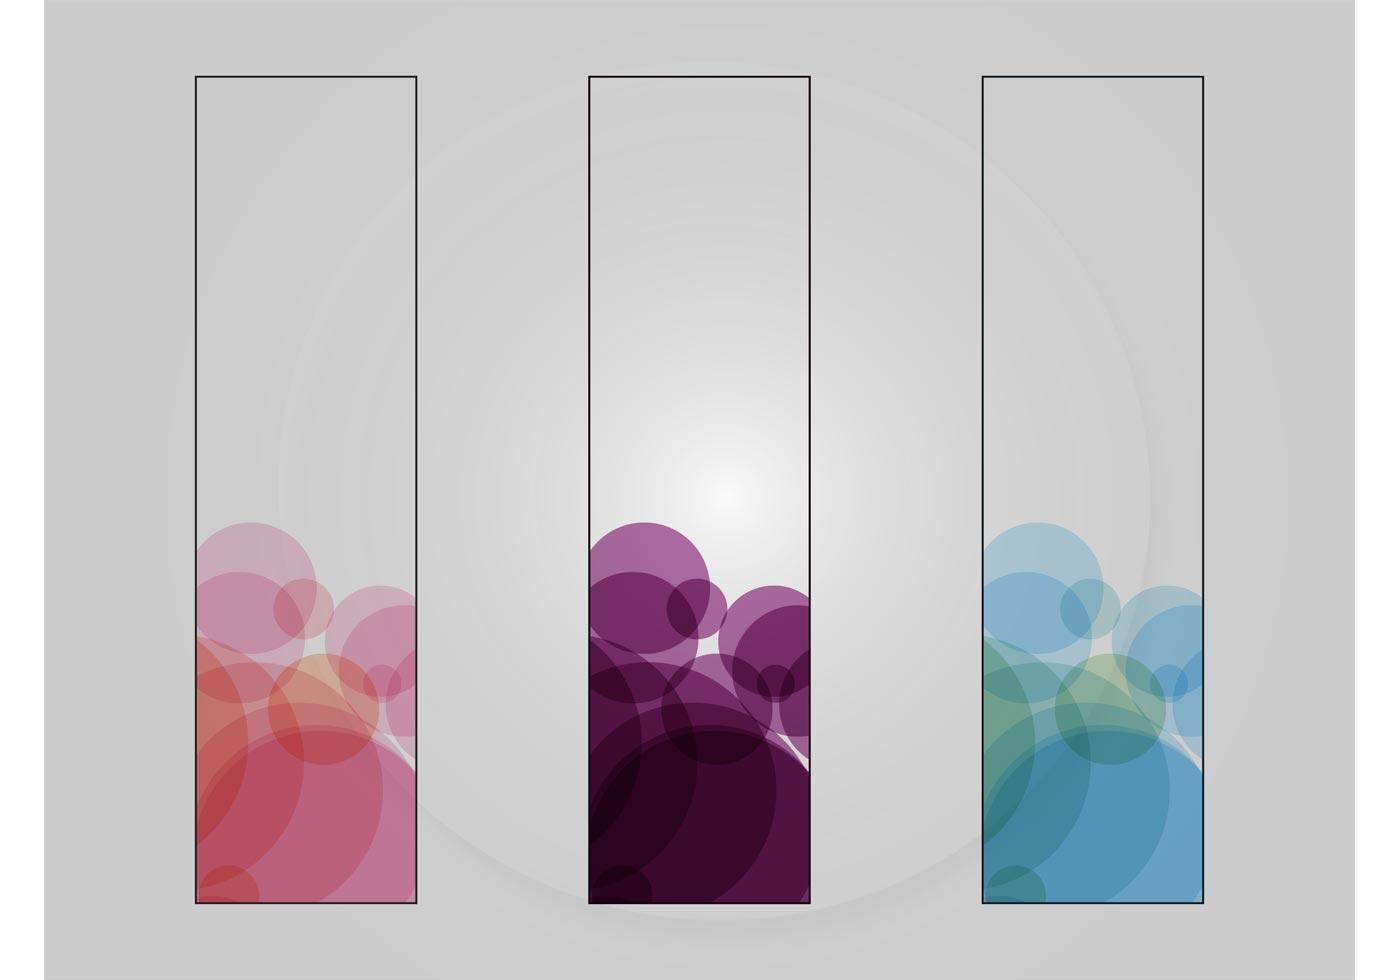 Illustrator Banners - Download Free Vector Art, Stock ...